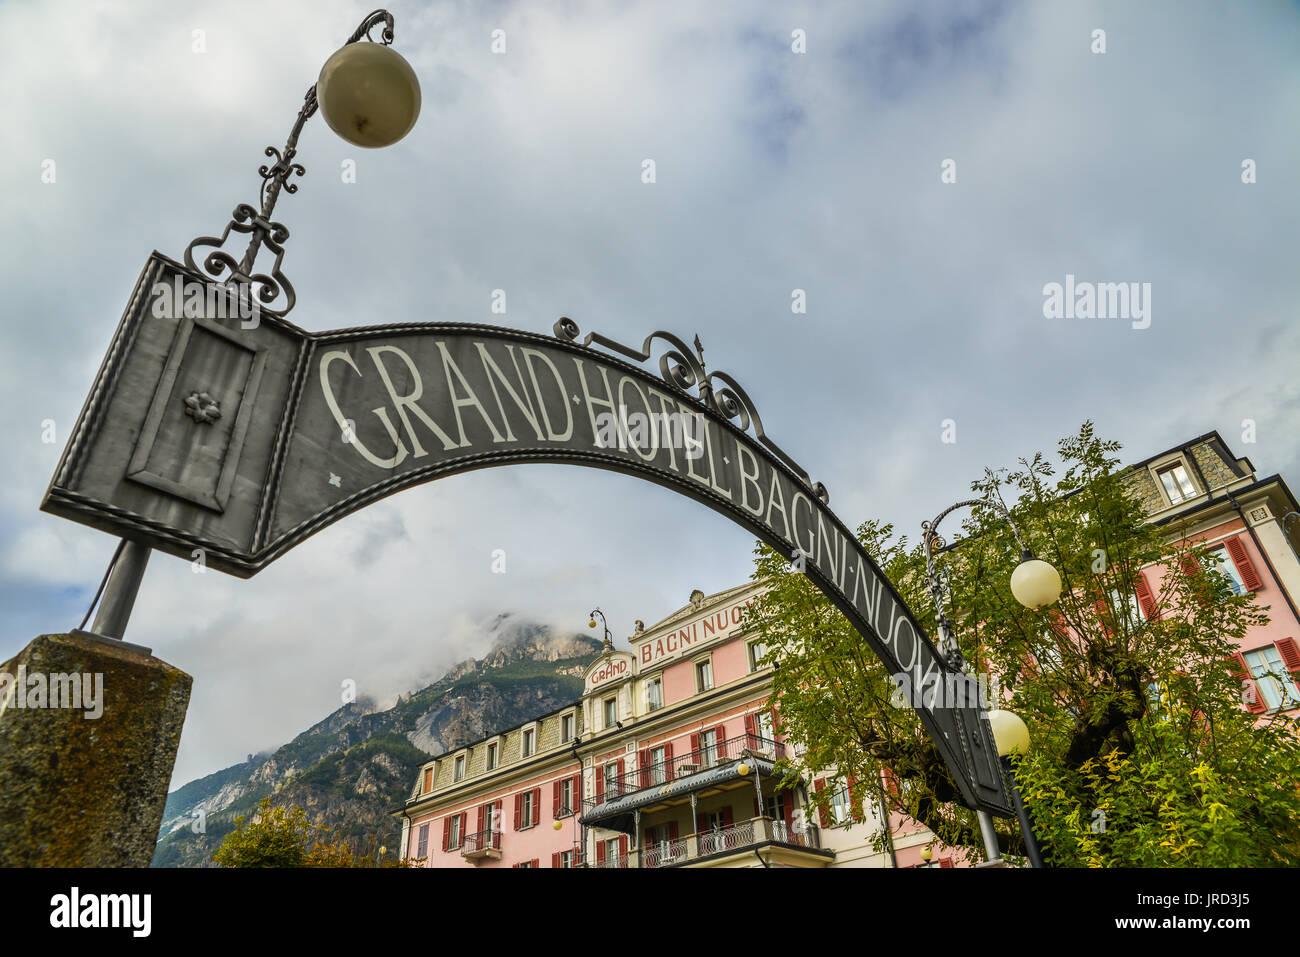 https://c8.alamy.com/comp/JRD3J5/grand-hotel-bagni-nuovi-in-bormio-italy-JRD3J5.jpg